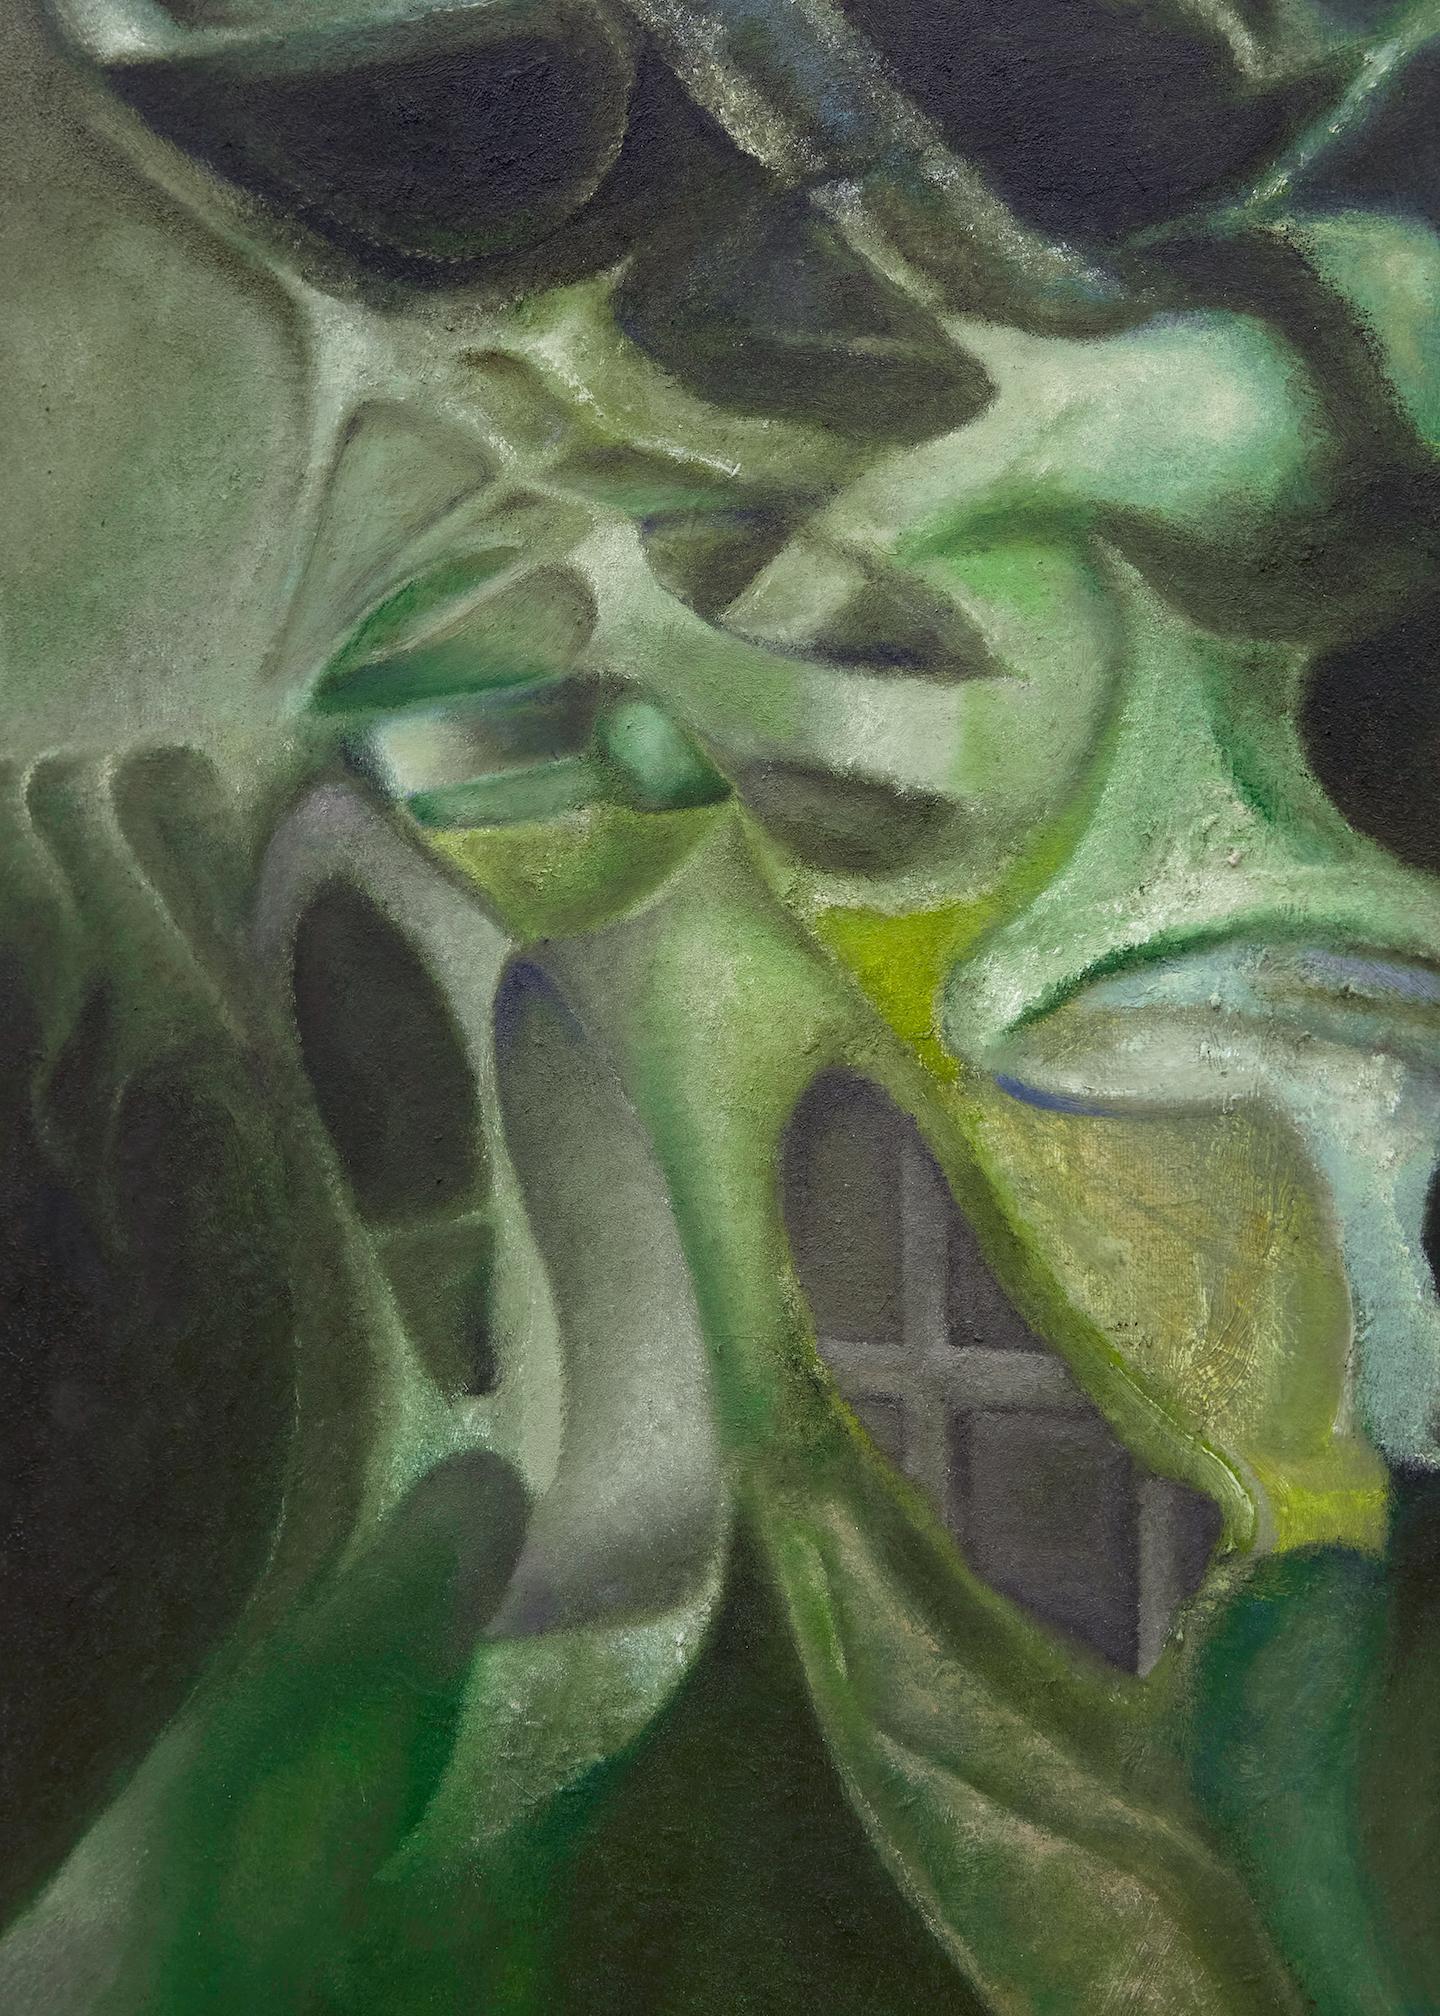 Kin-ting Li, 'Syntheses', 2020. Oil on canvas, 60 x 50 cm.photo: Corey Bartle Sanderson